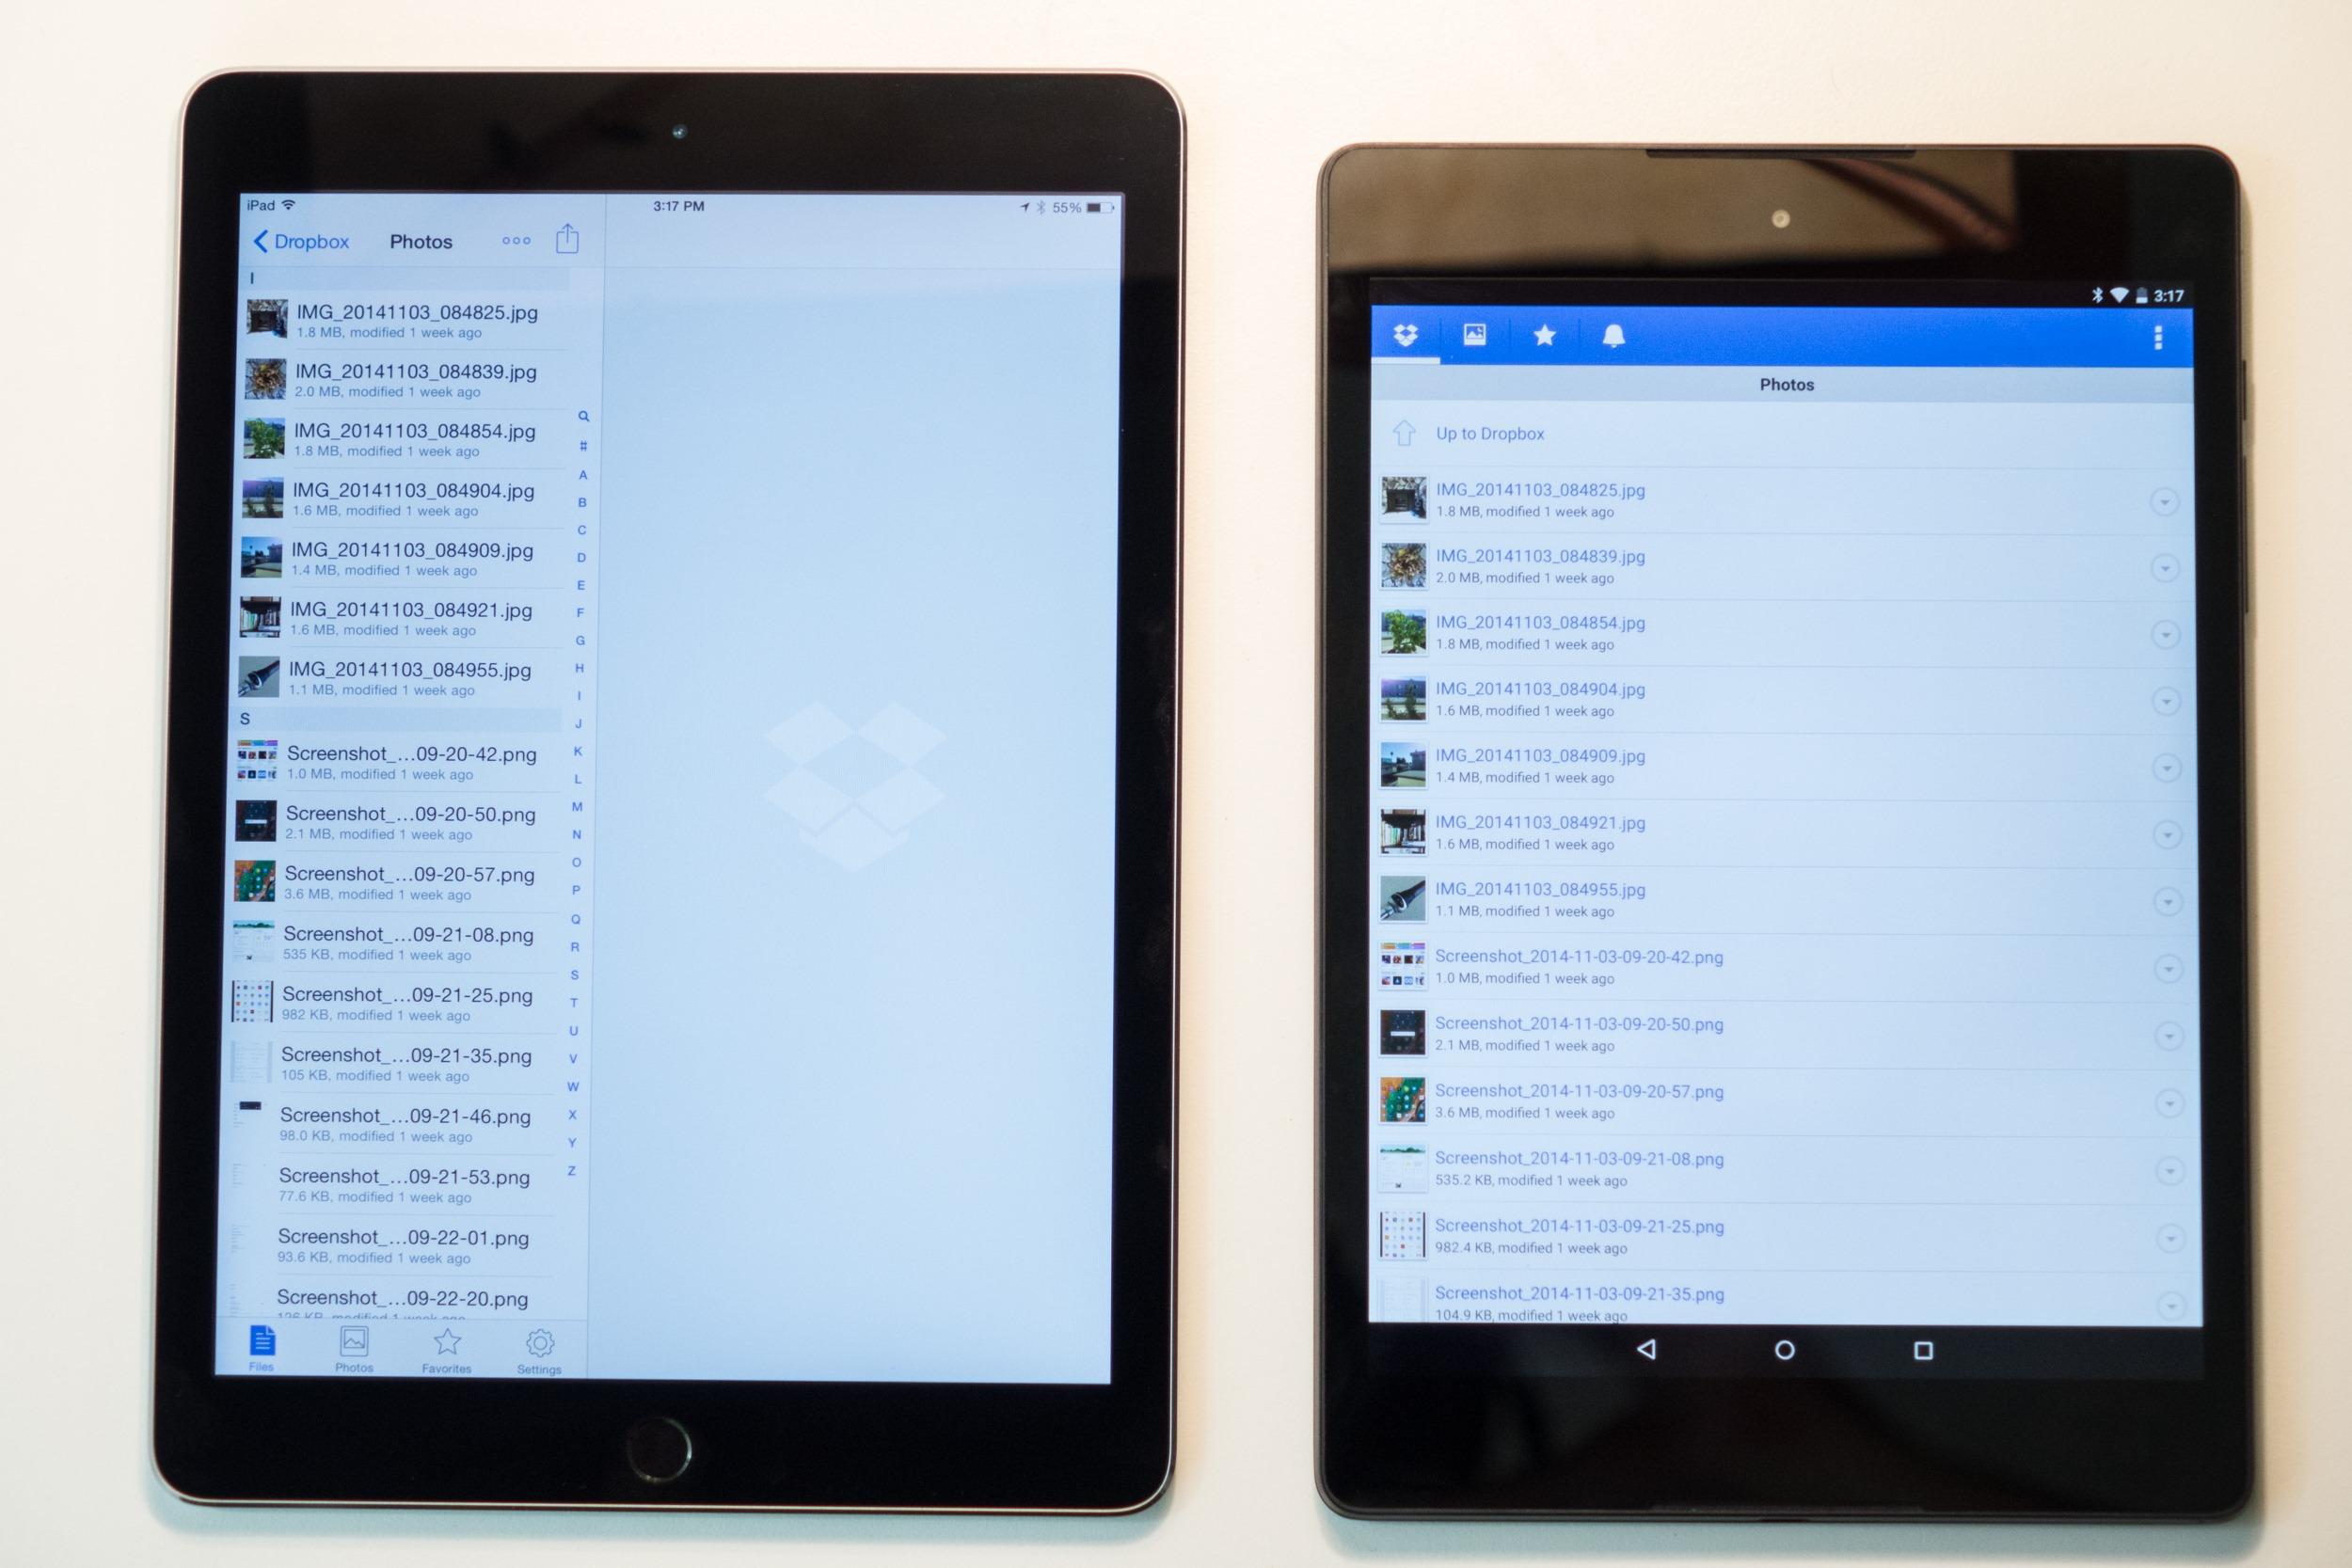 nexus 9 vs ipad air 2 a mostly subjective comparison